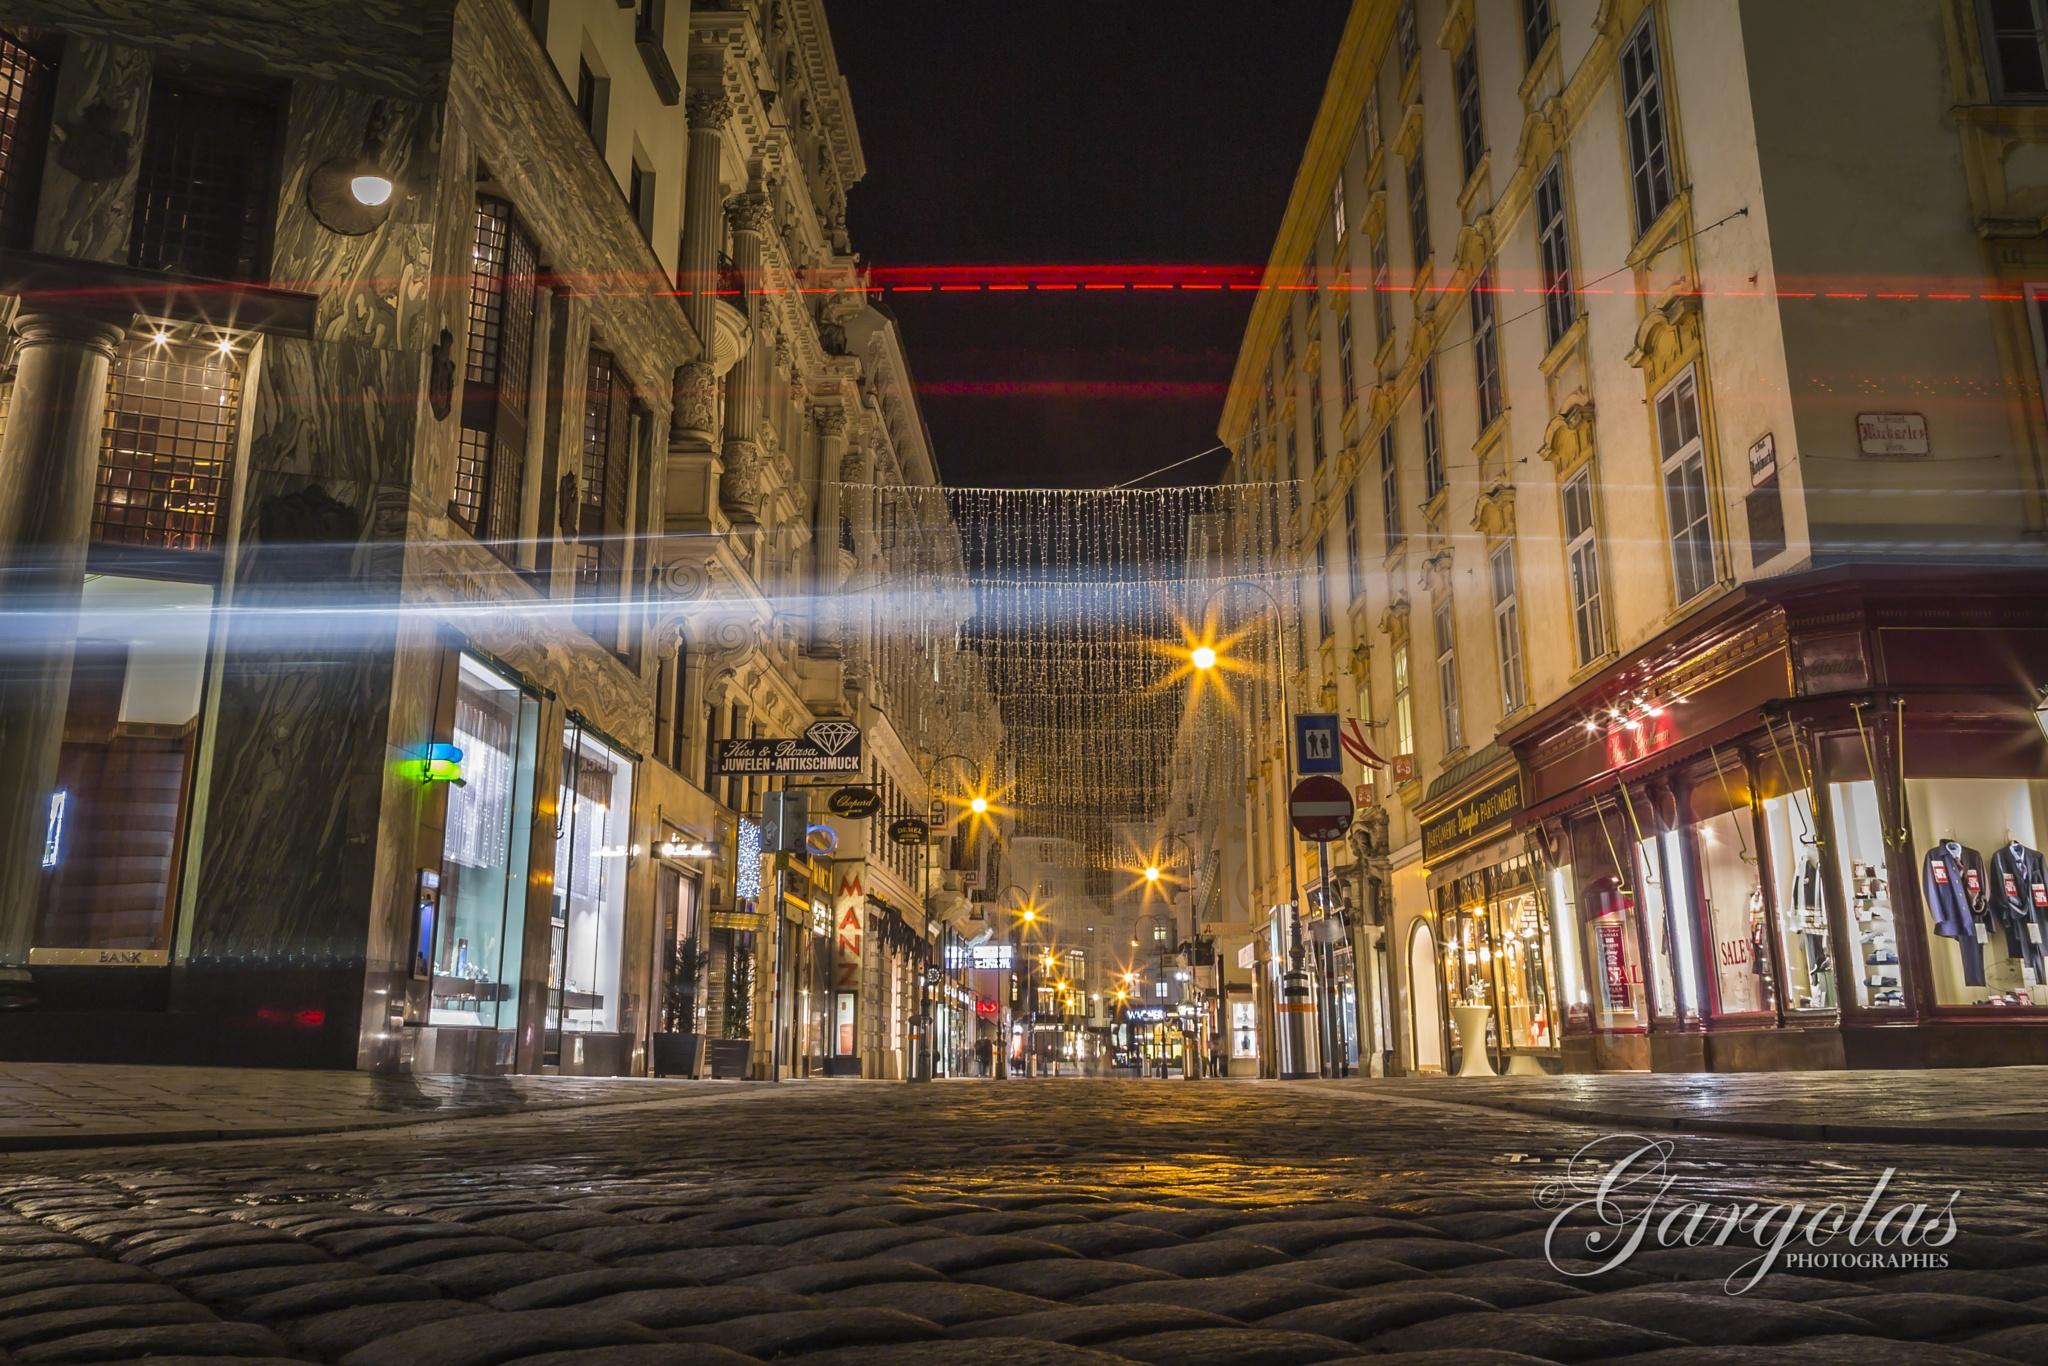 A Night in Vienna by Gargolas Photographes